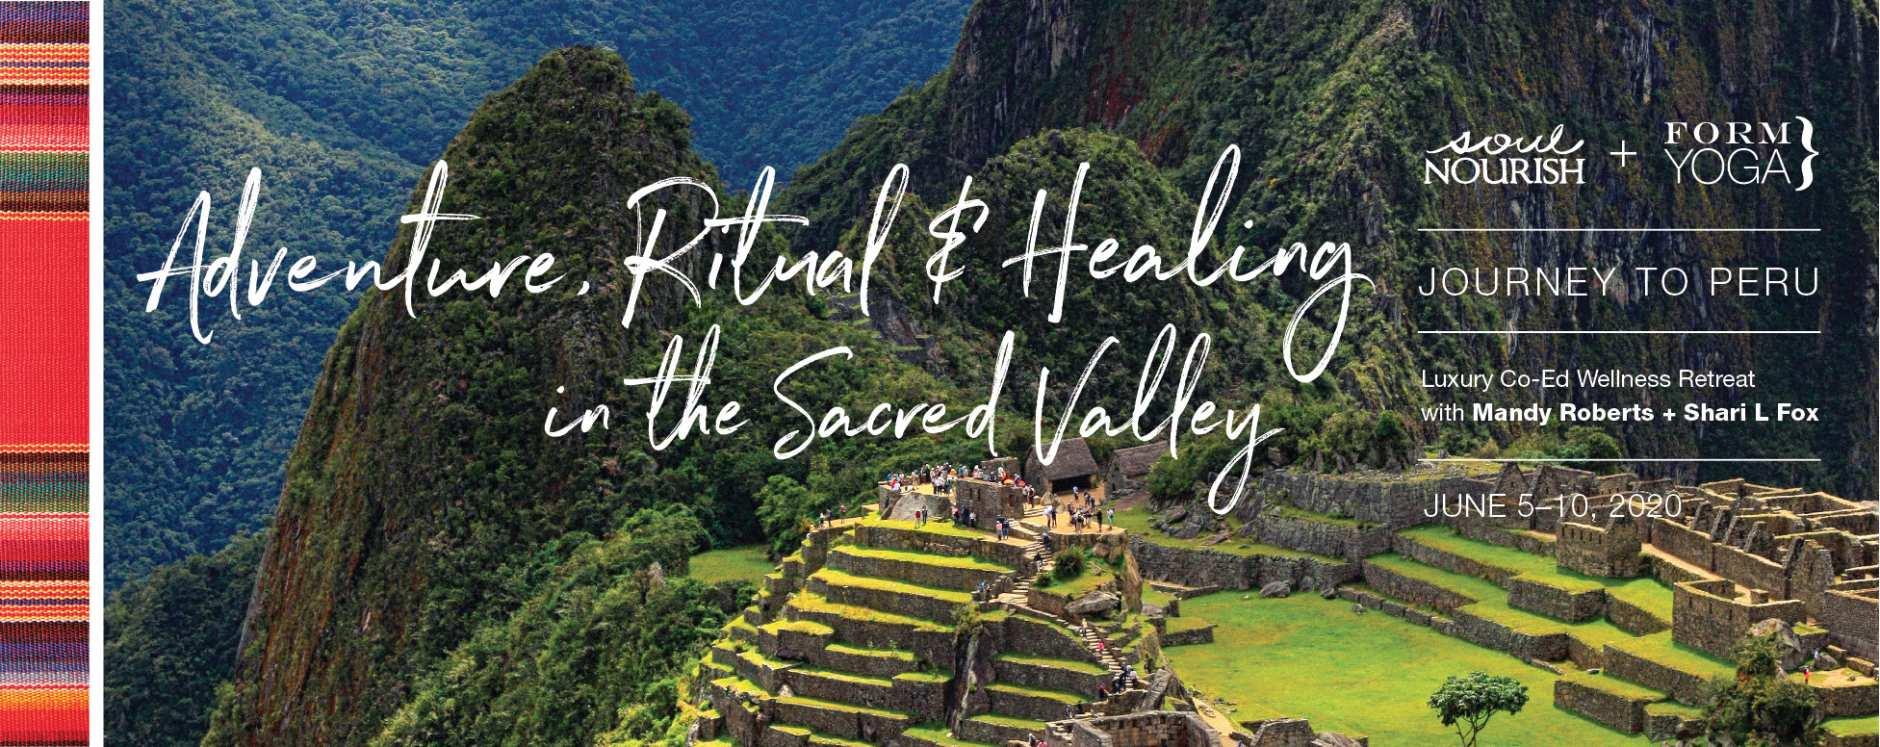 peru retreat yoga co-ed sacred valley Soul Nourish adventure healing ritual